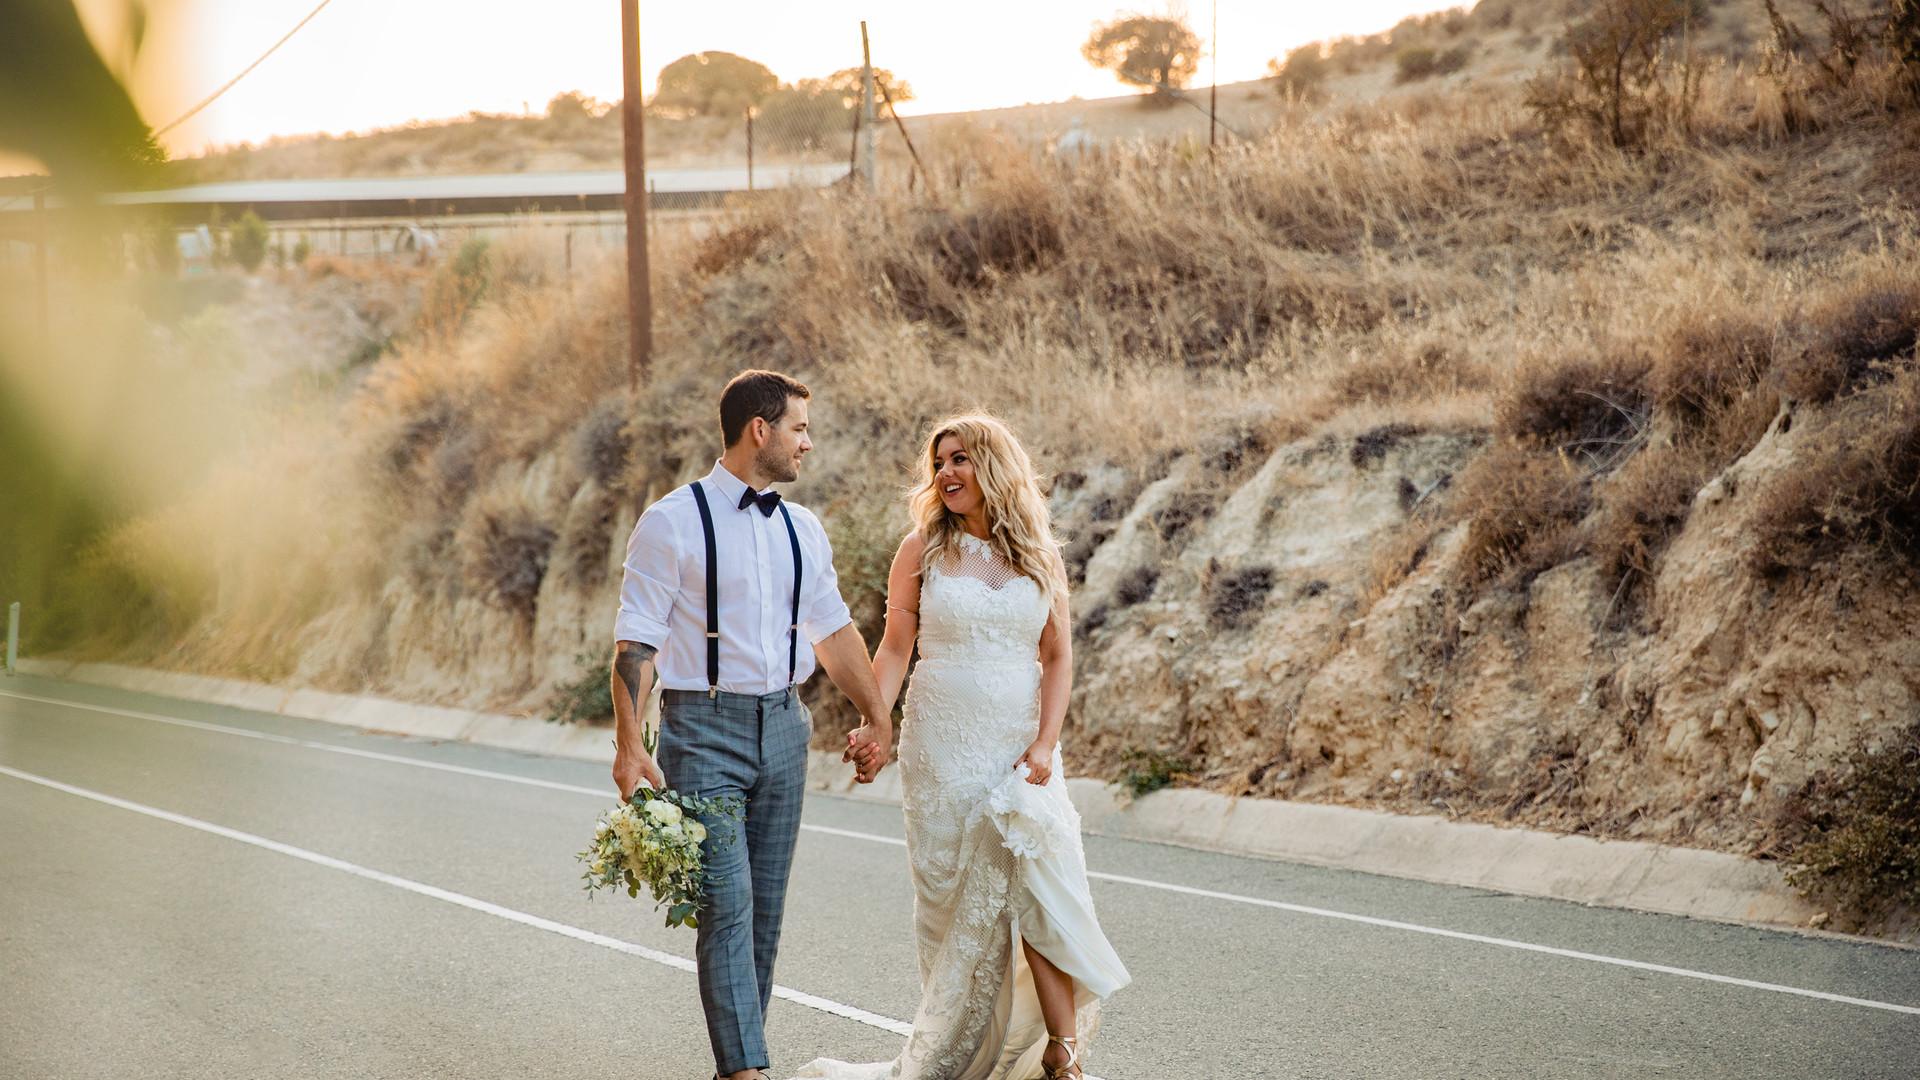 Vasilias Nikoklis Inn Special 2019 Winter Wedding Package